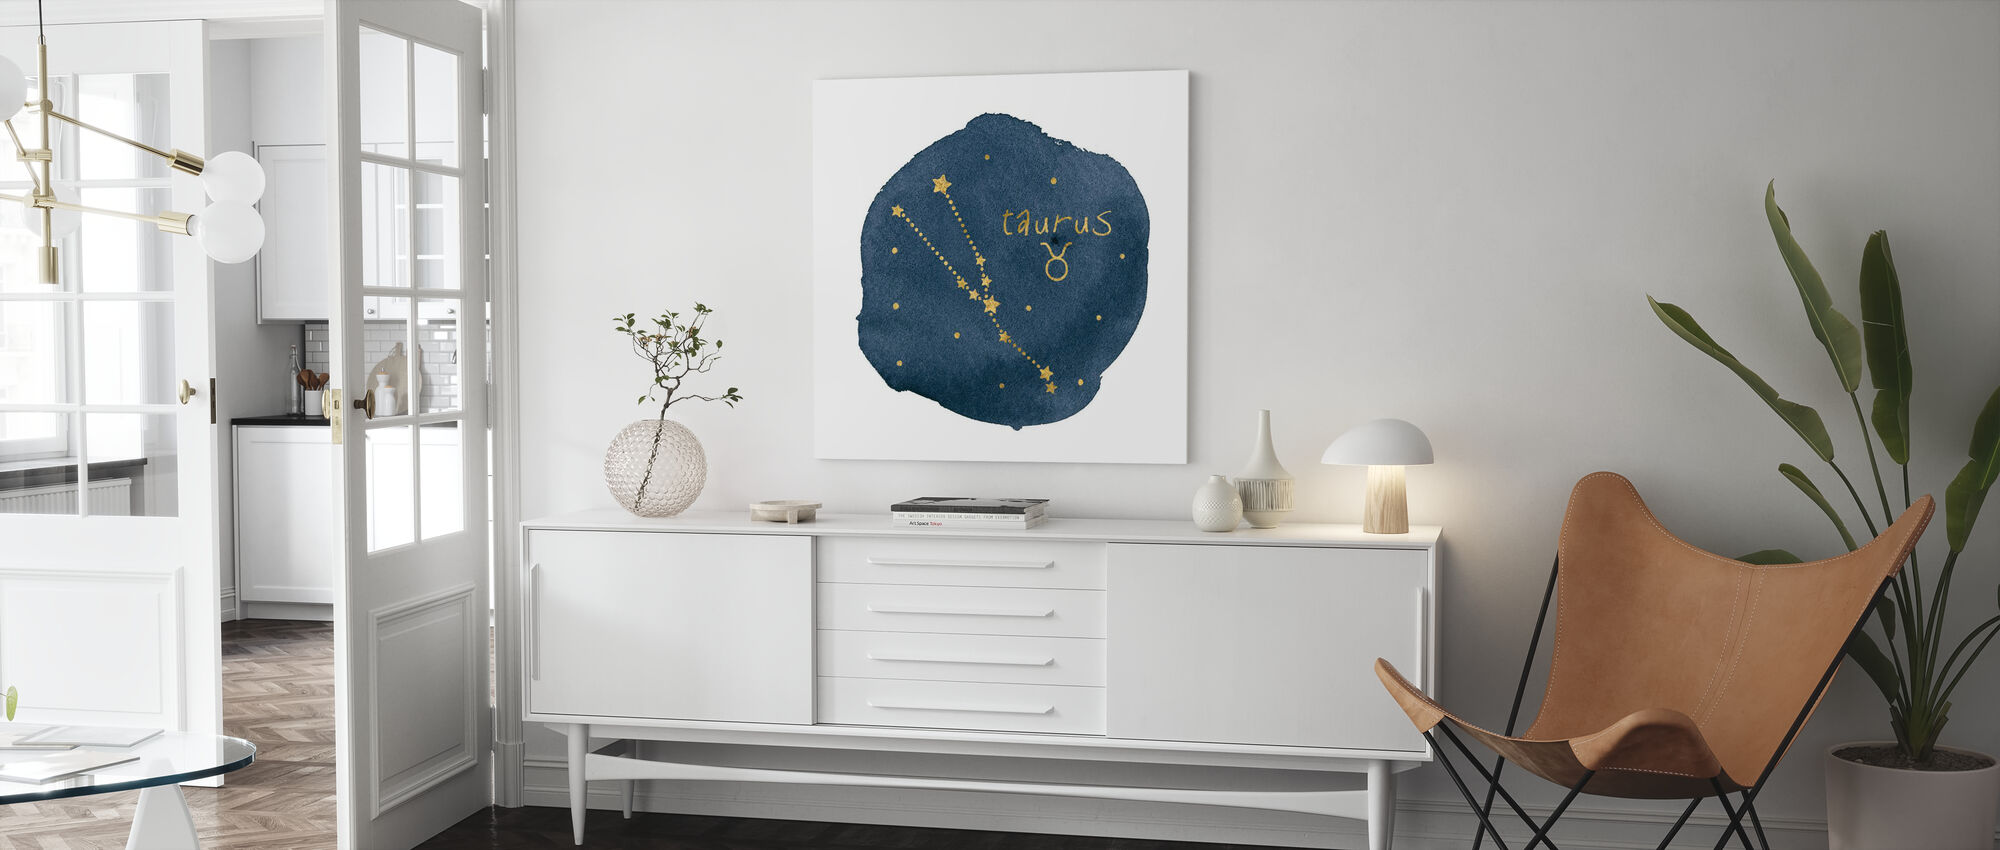 Horoskop Oxen - Canvastavla - Vardagsrum